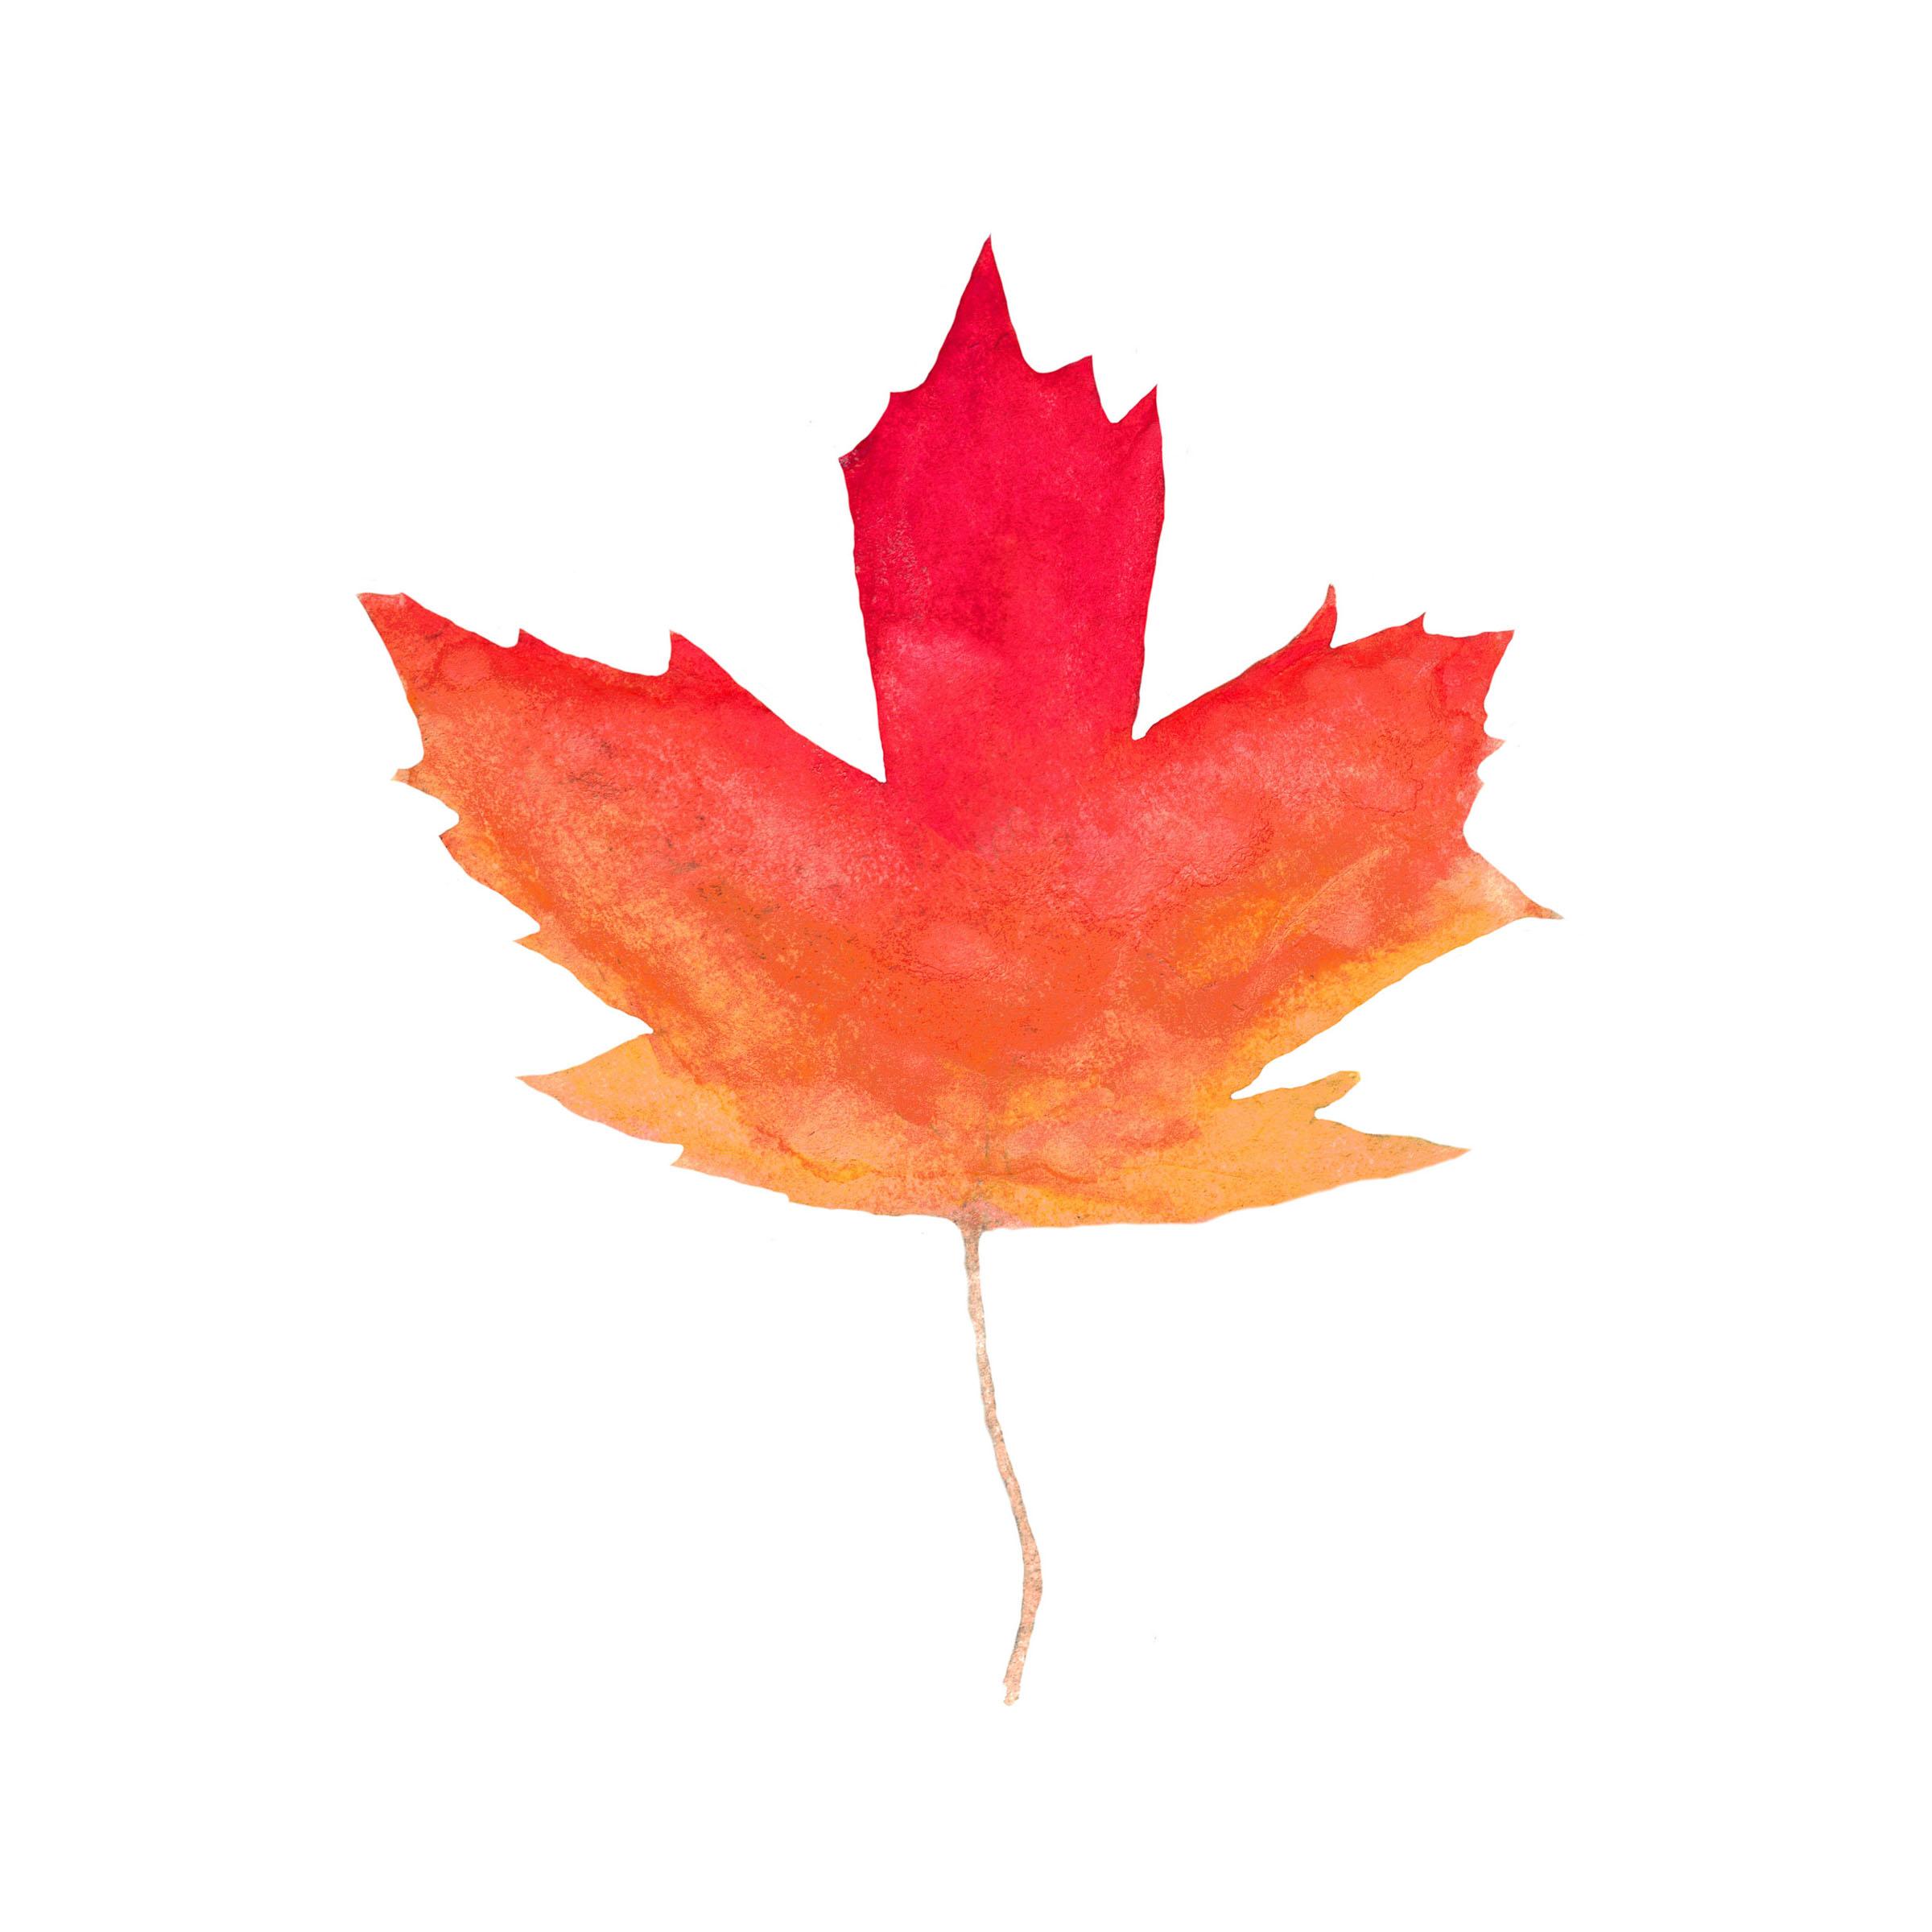 Canadian Maple Leaf Watercolor Print by Aliya Bora